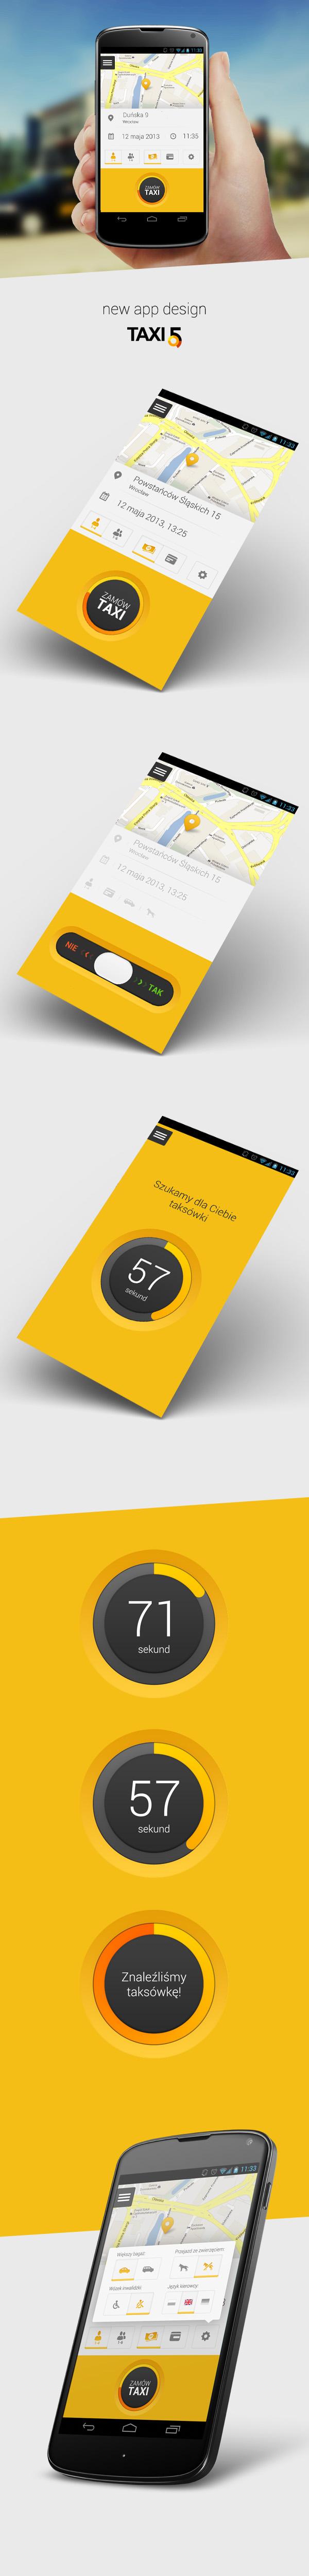 app app design design mobile mobile design nexus taxi5 taxi UI ux flat design application